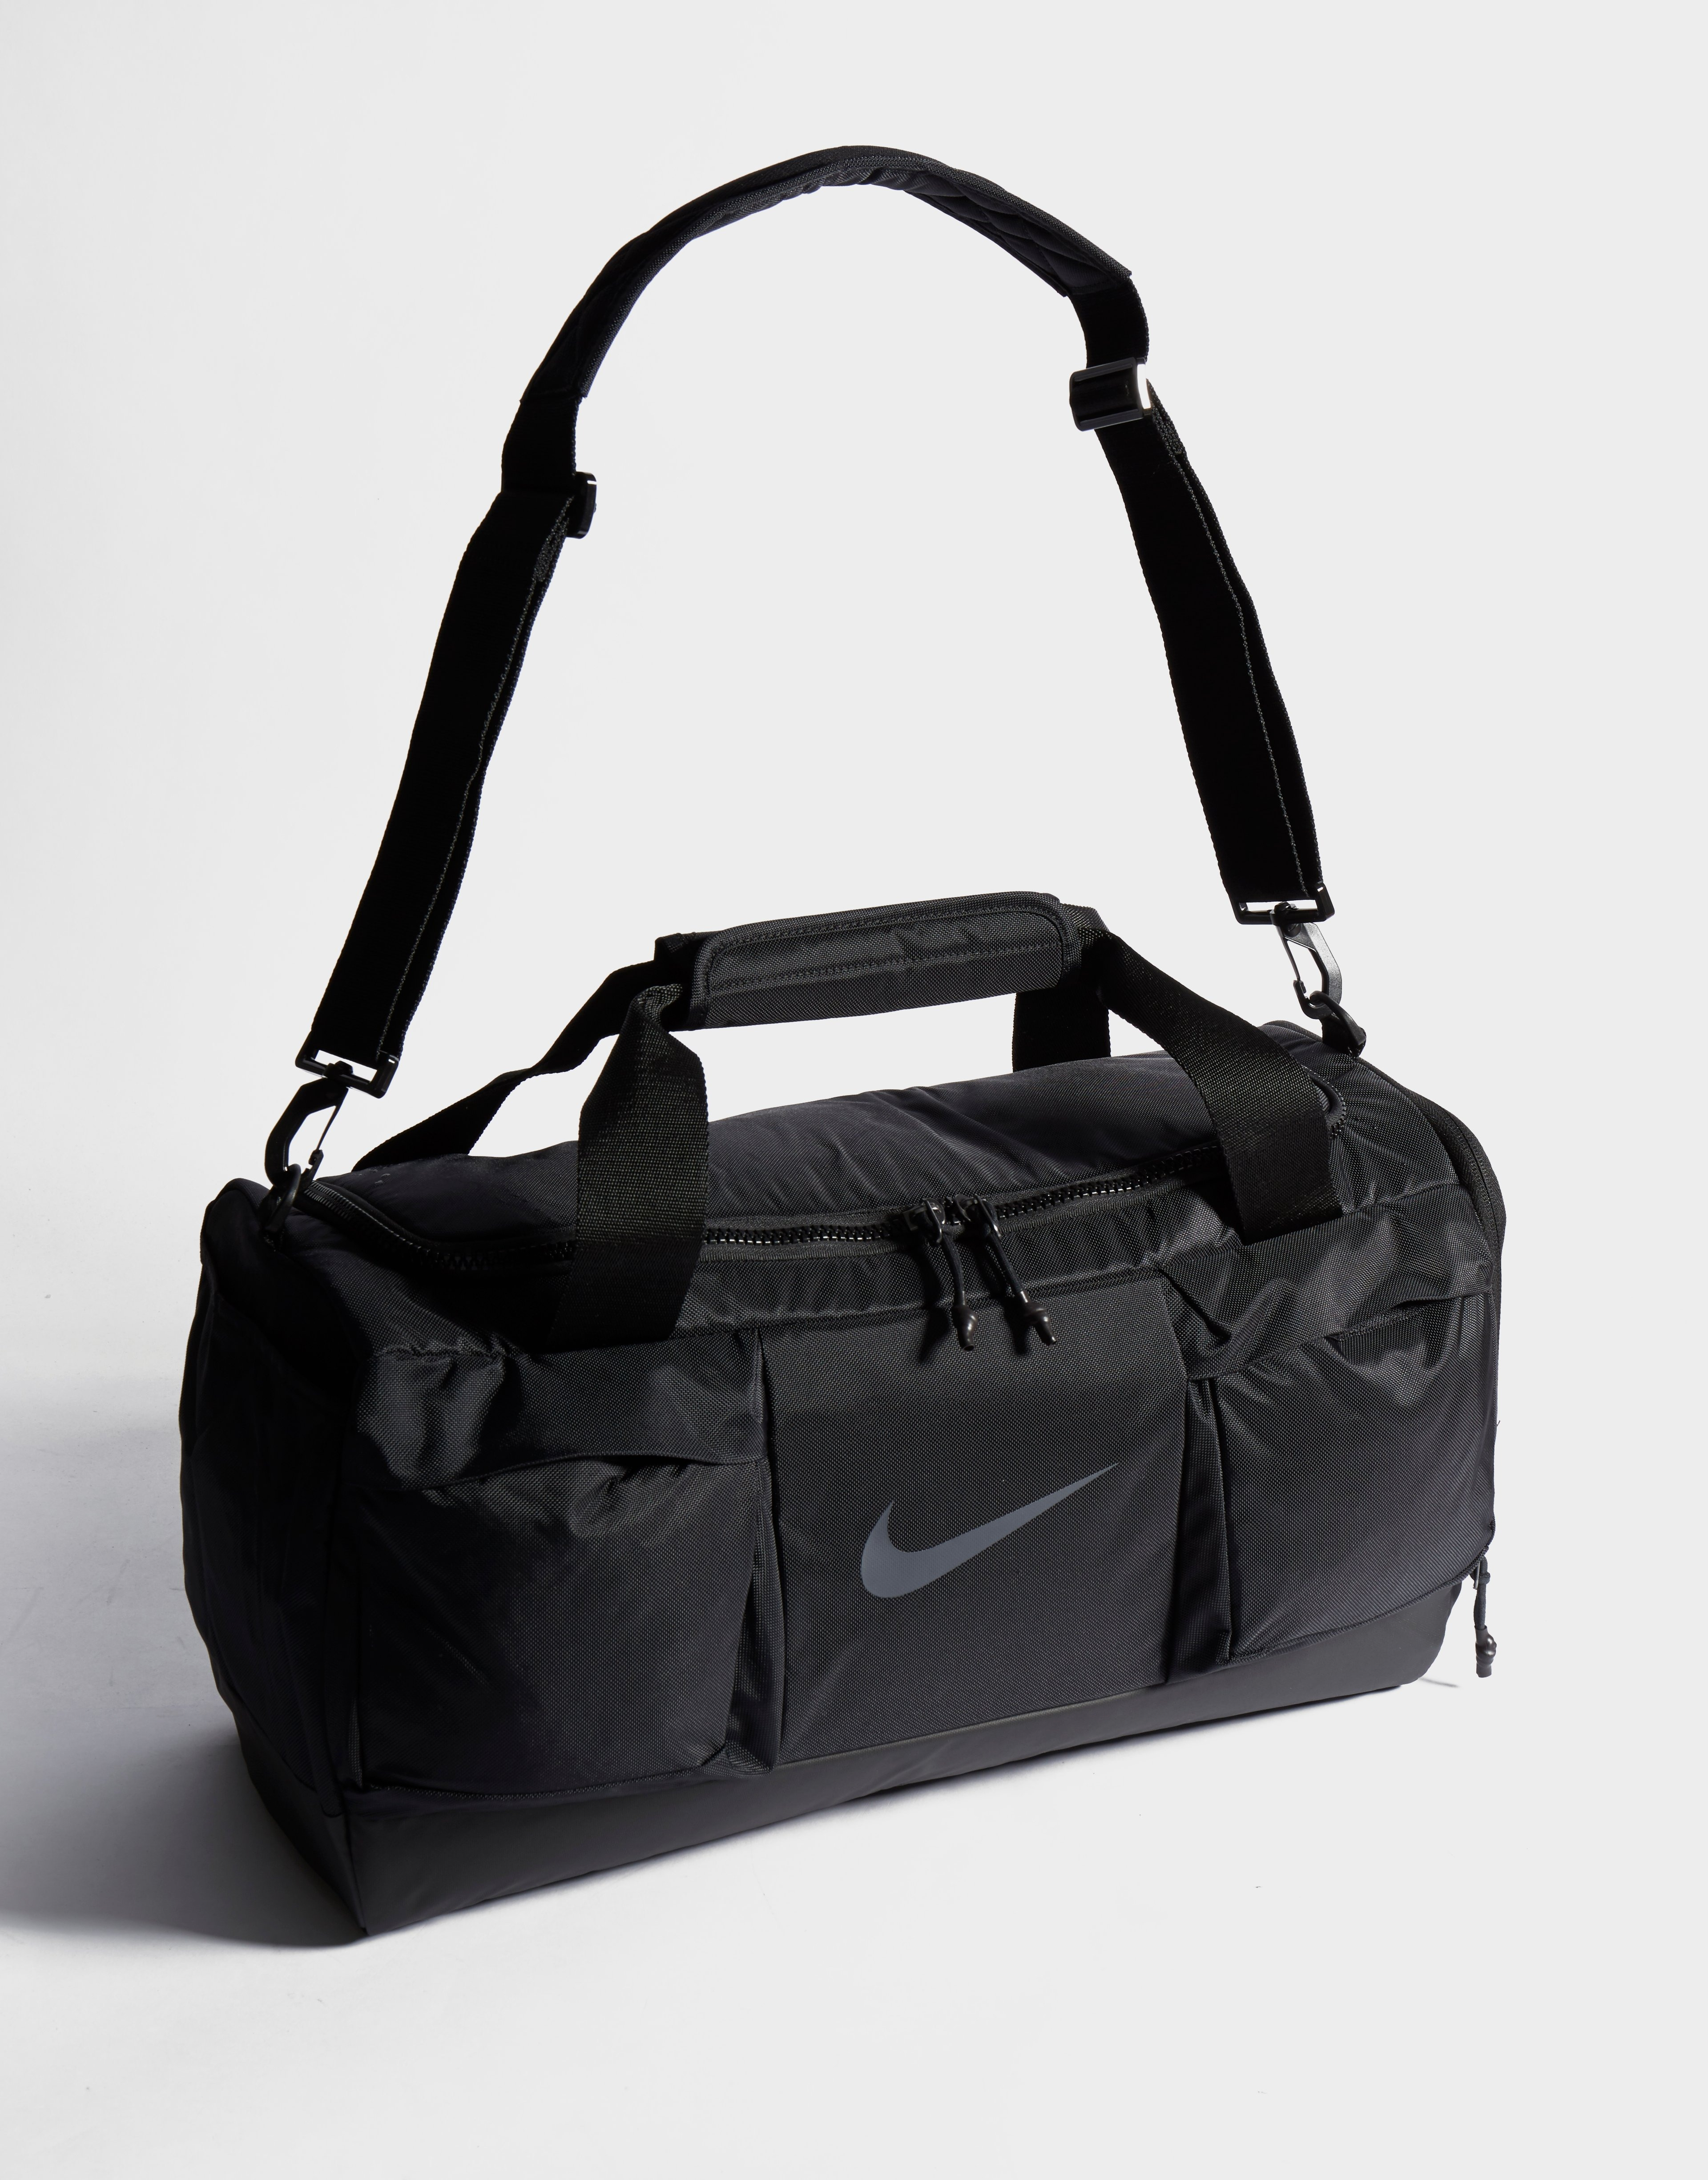 Nike Vapor Small Duffle Bag Jd